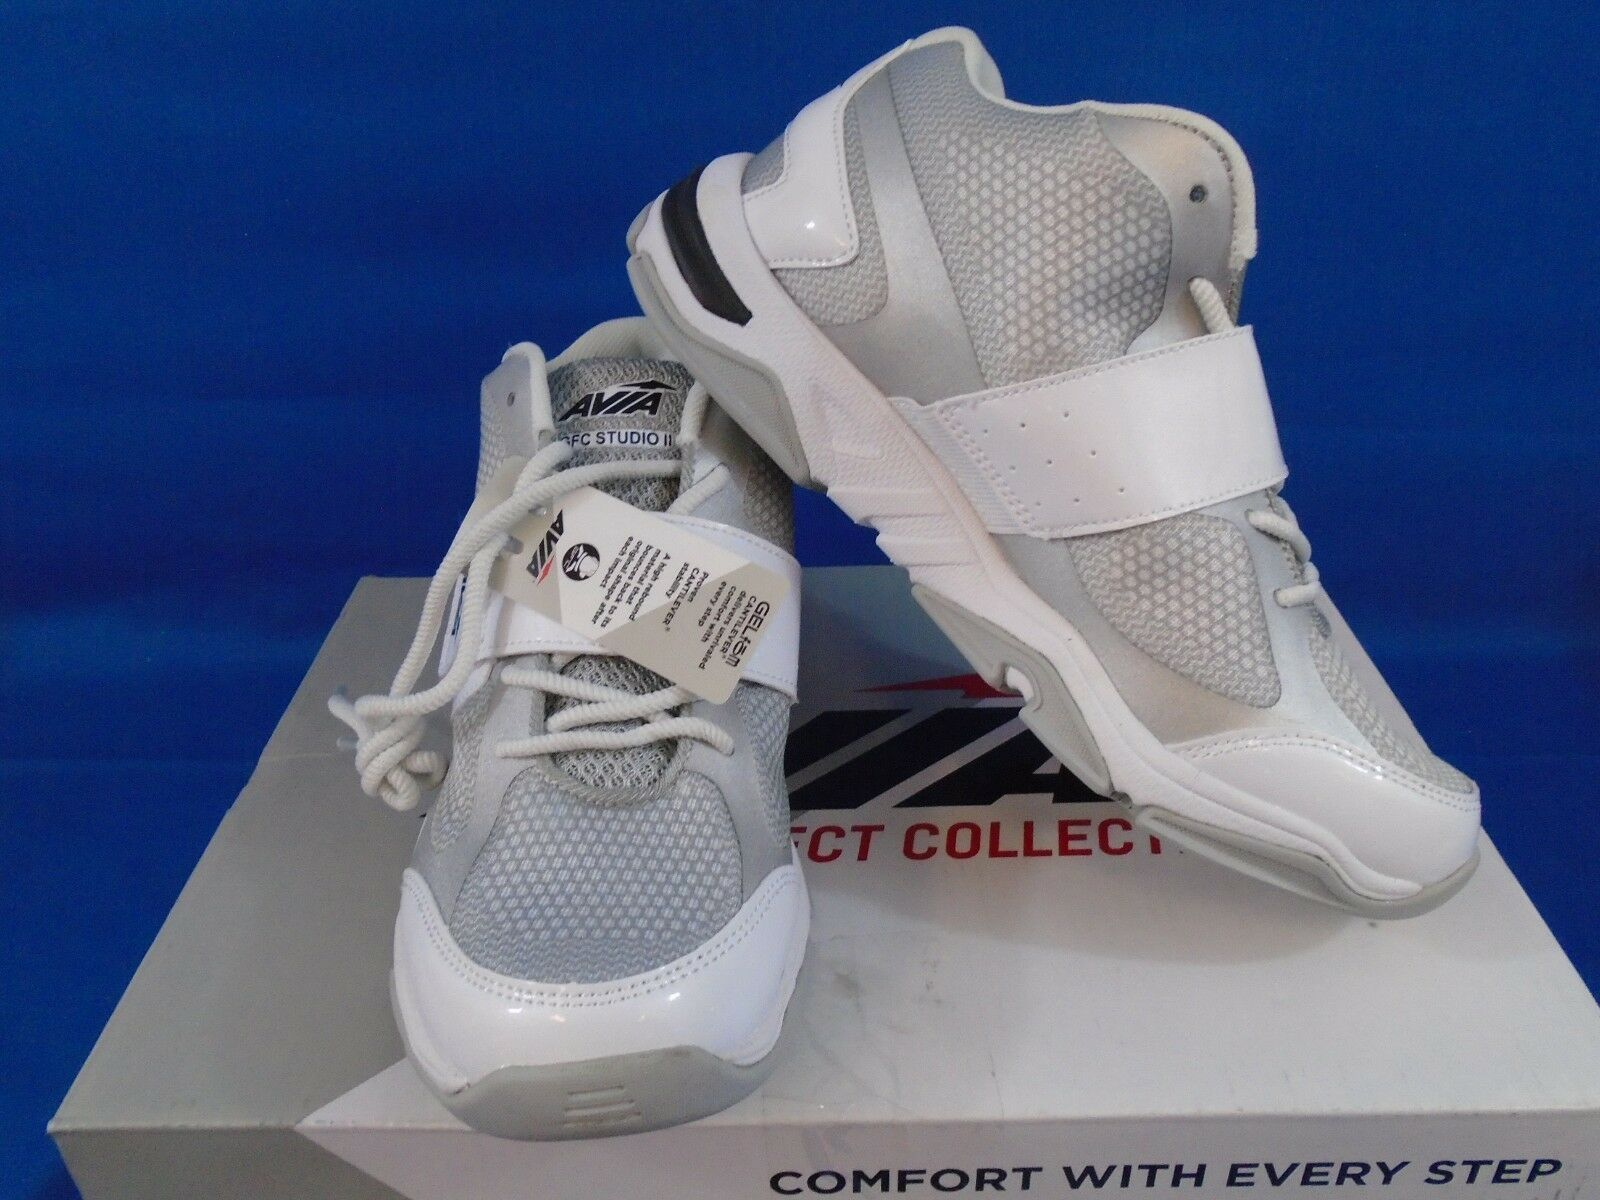 Women's Avia GFC Studio II A1469WWSX White/Silver/Black Shoes Size 6M